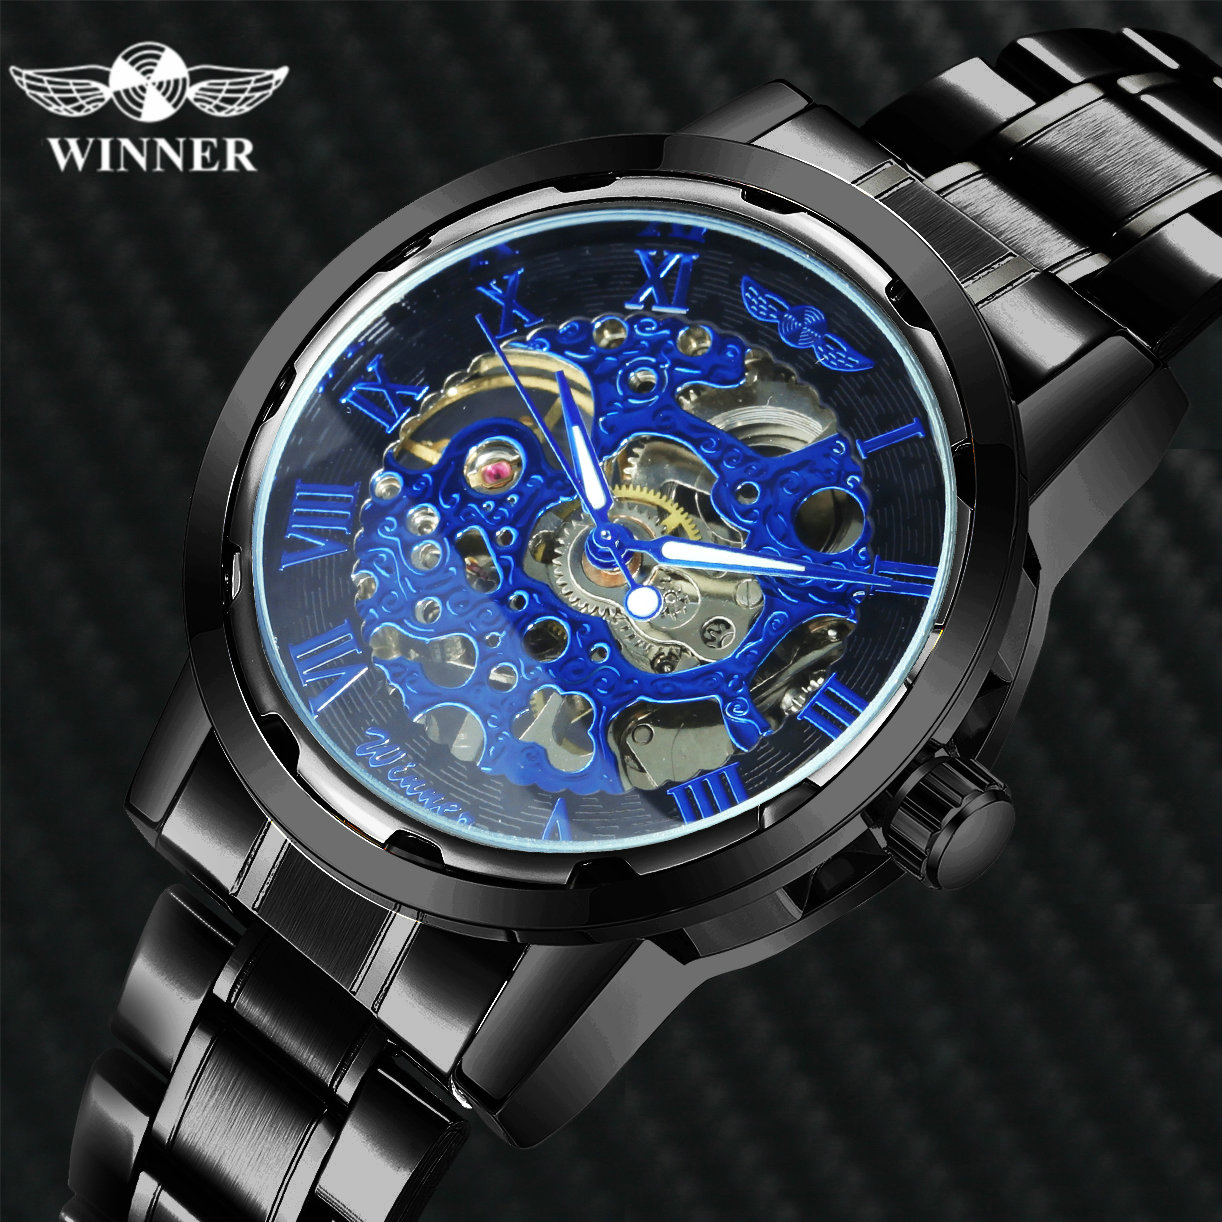 WINNER Mechanical Watch For Men Fashion Skeleton Watches Stainless Steel Strap Luminous Hands Male Wristwatch Dress Reloj Hombre